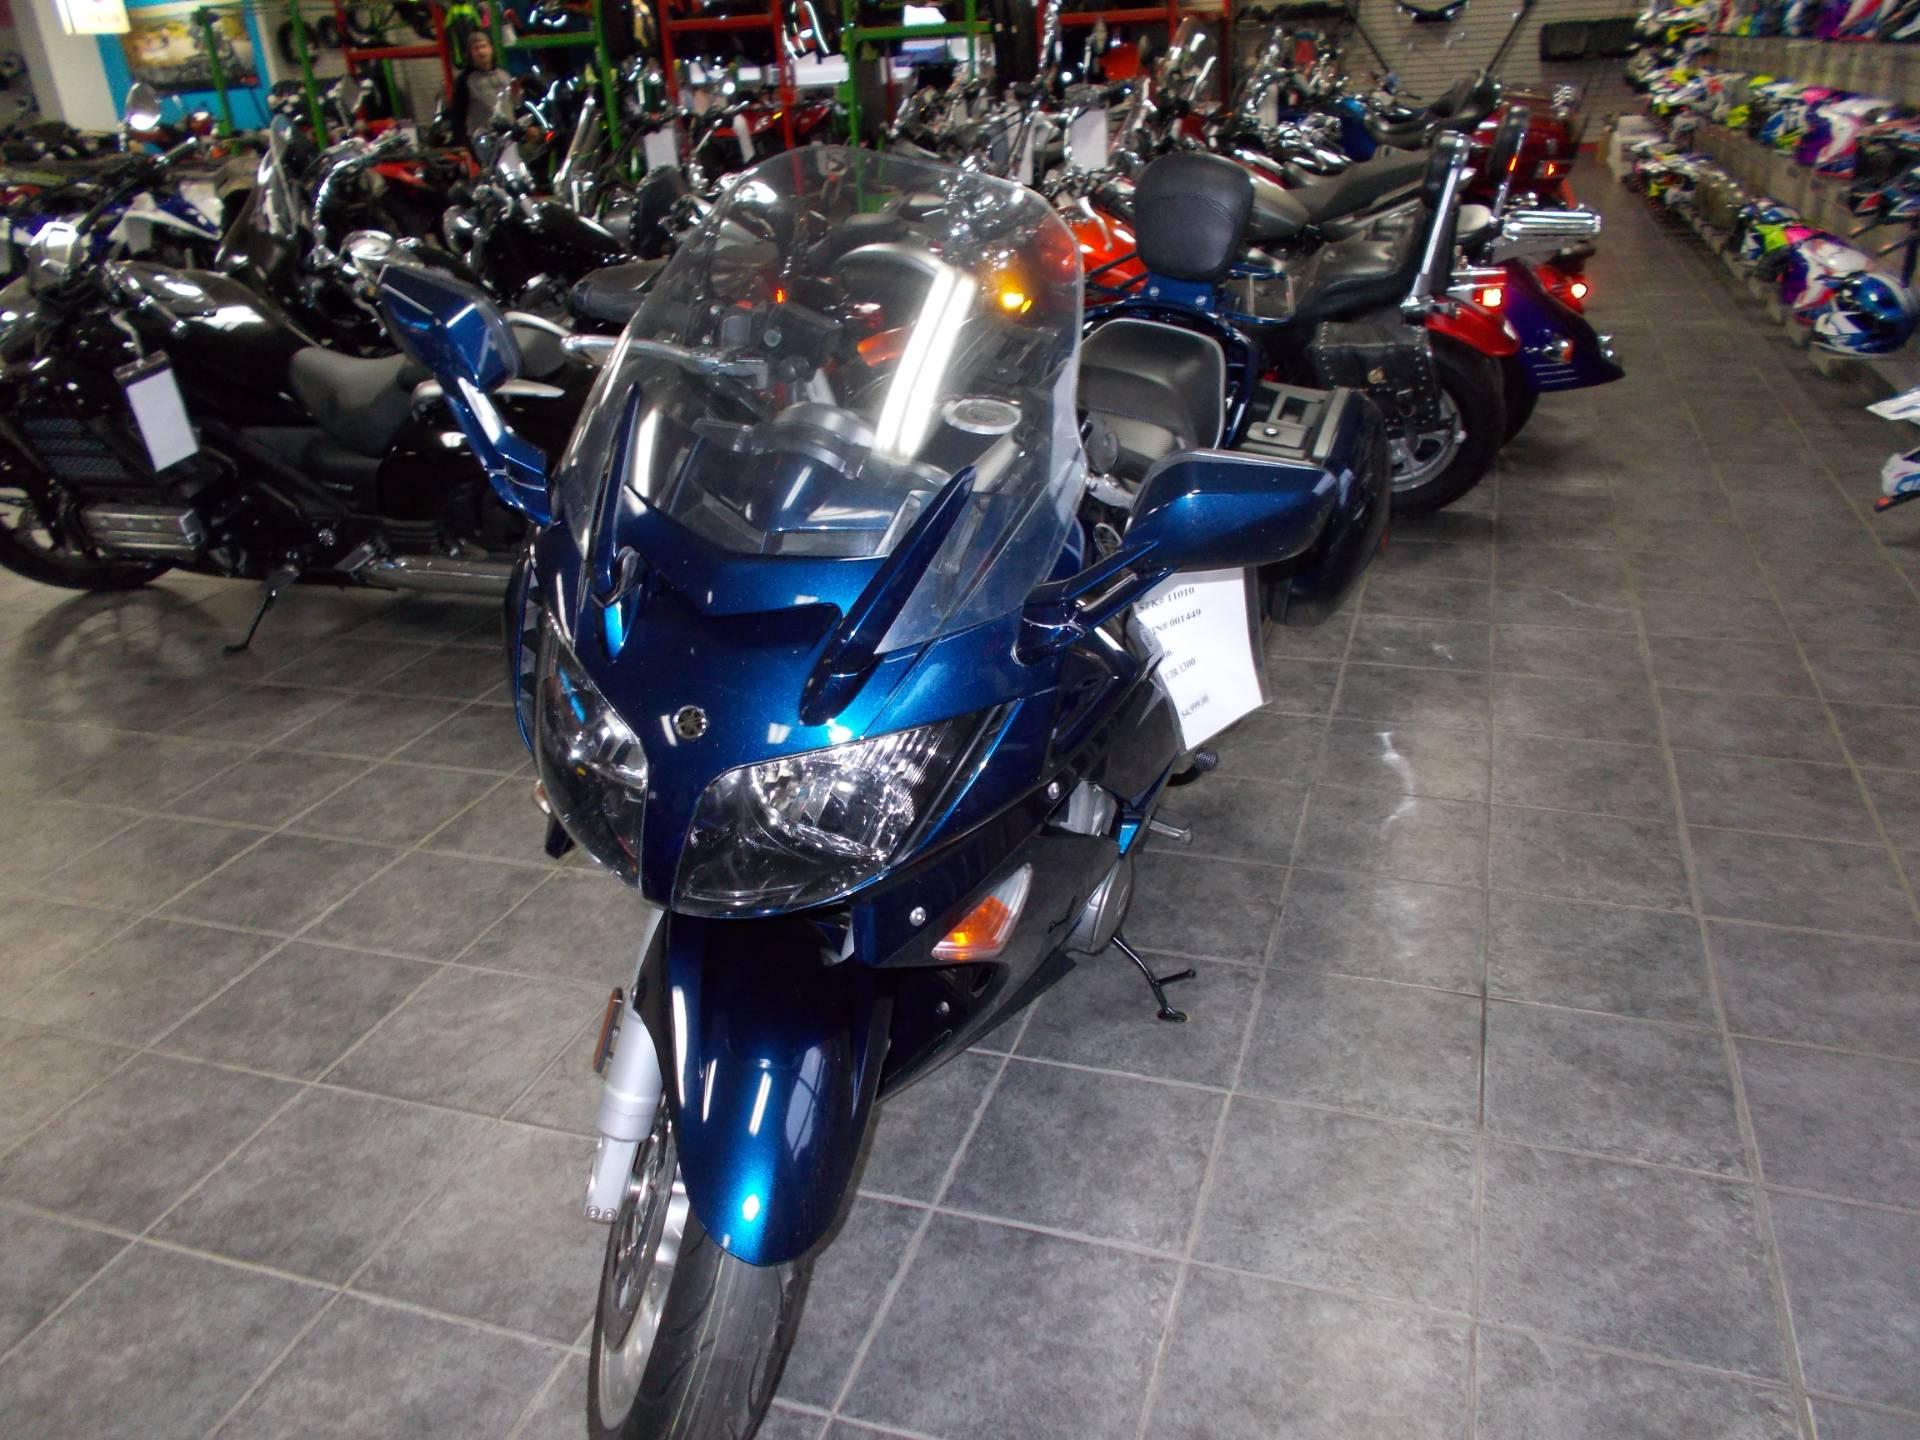 2006 Yamaha FJR 1300A 4